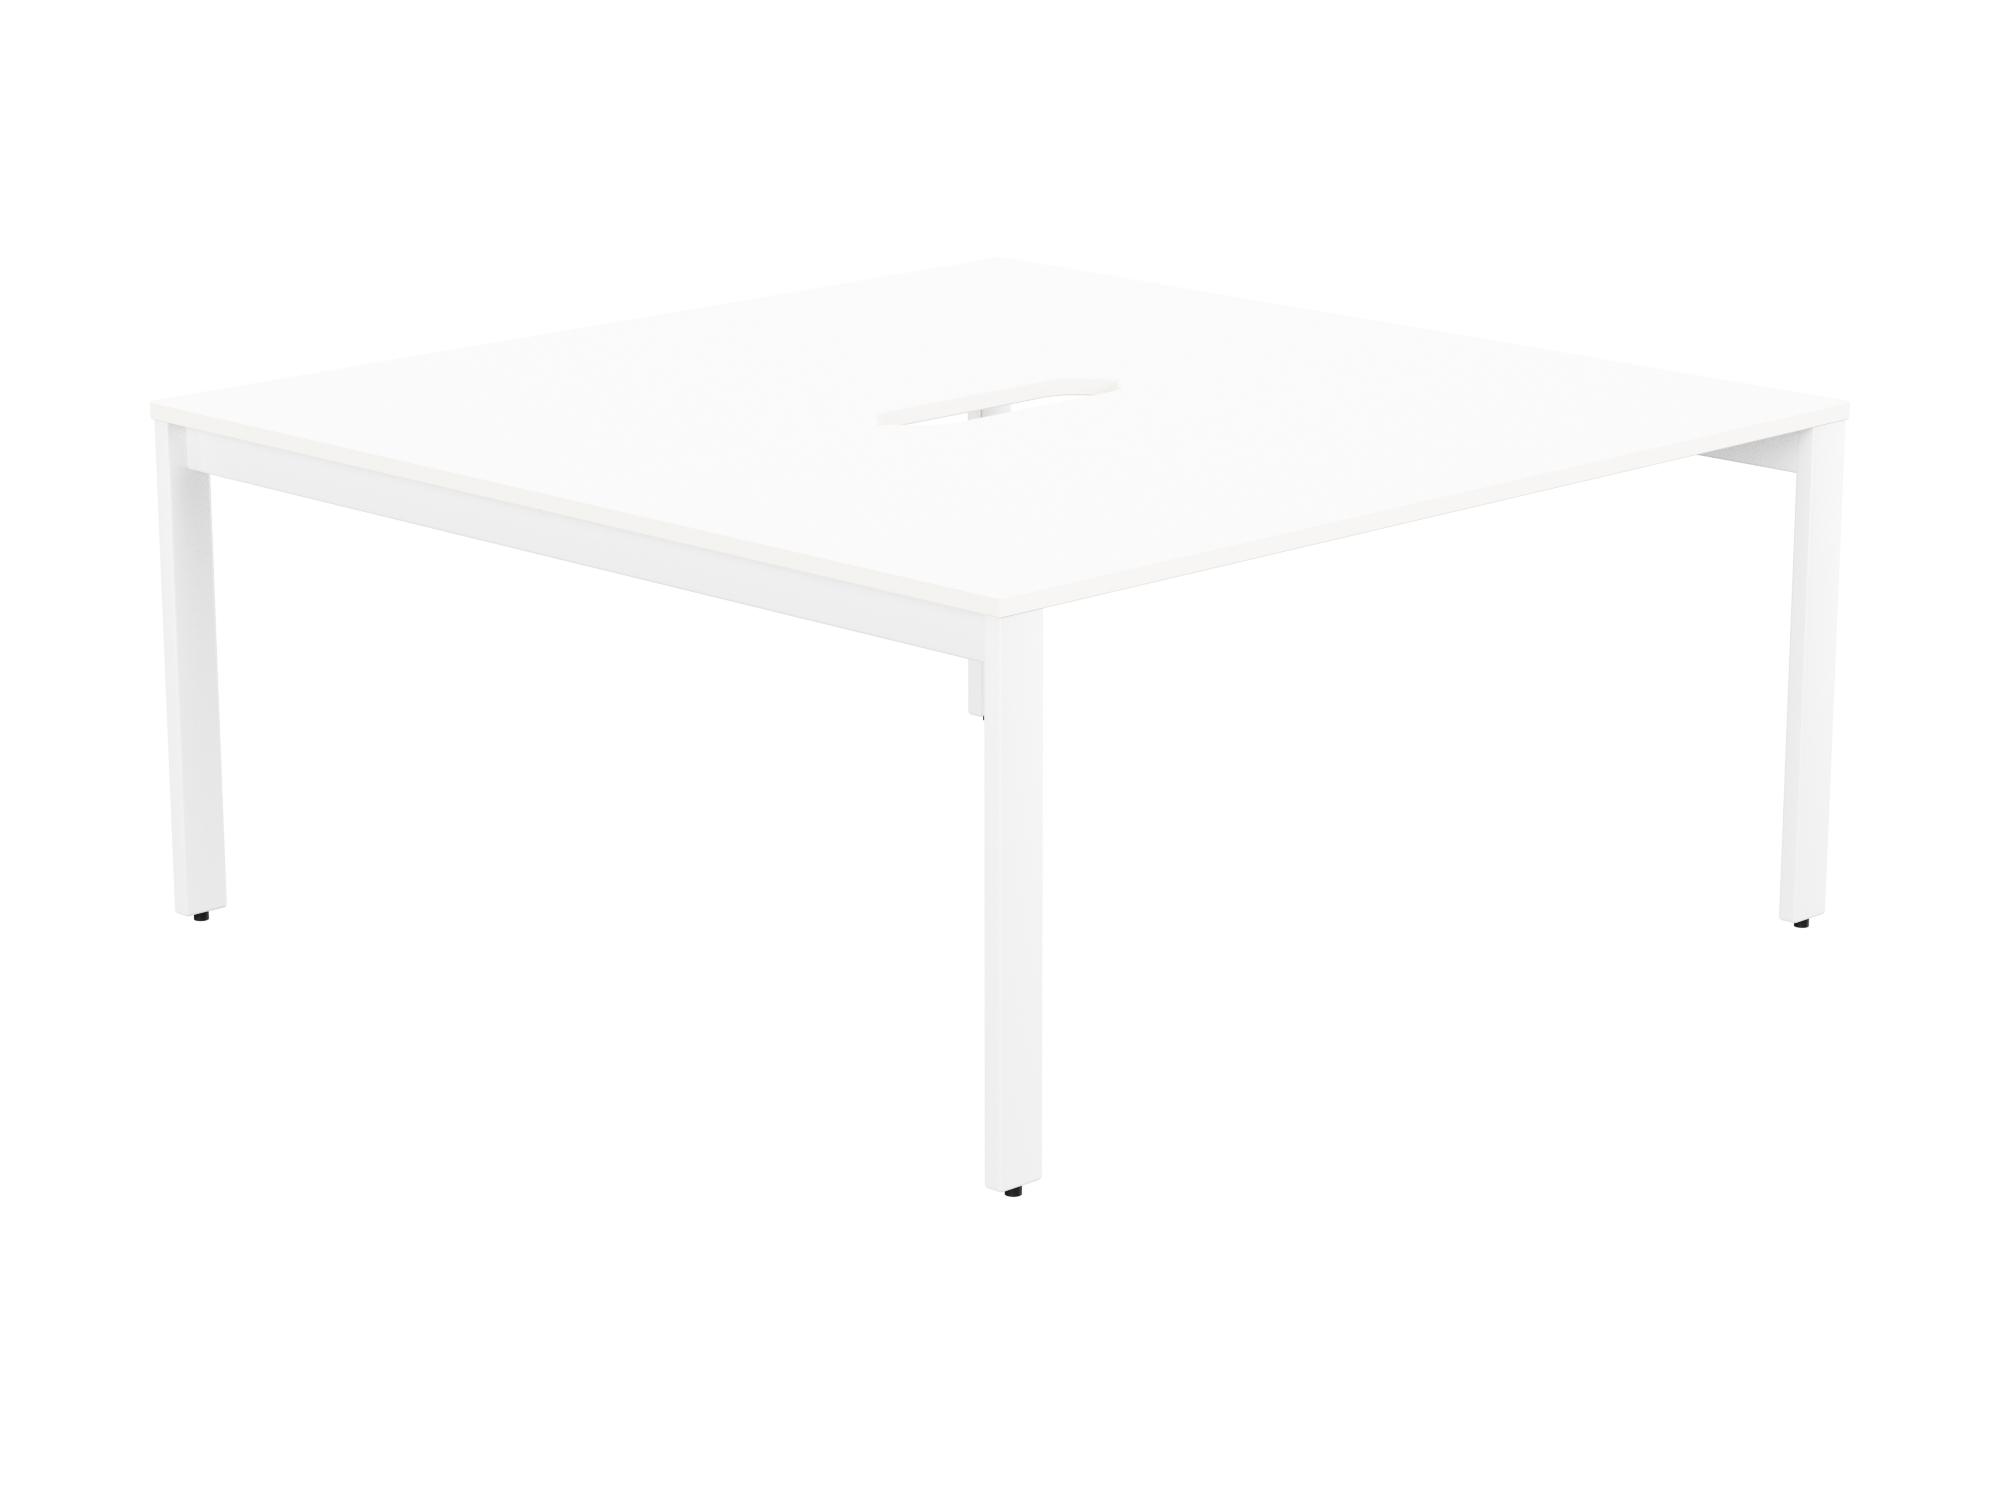 Switch 2 Person Bench Open Leg Scallop Top 1600 x 800 - White Frame / White Top